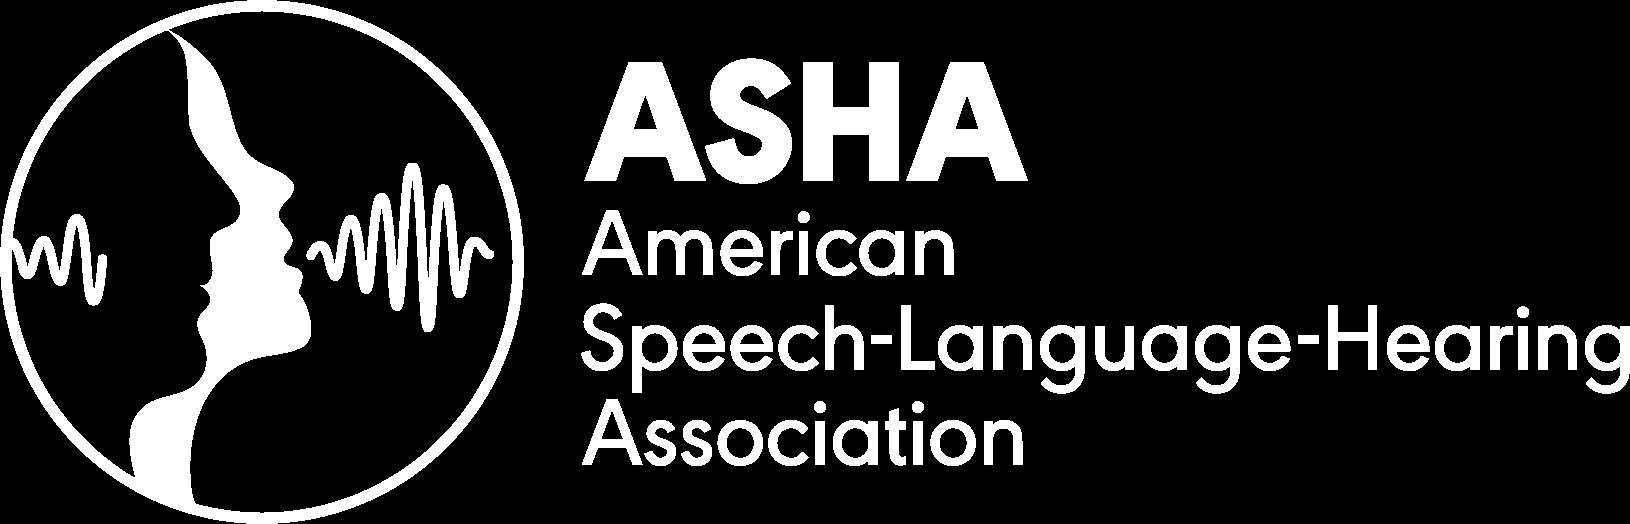 ASHA Certification Assets.